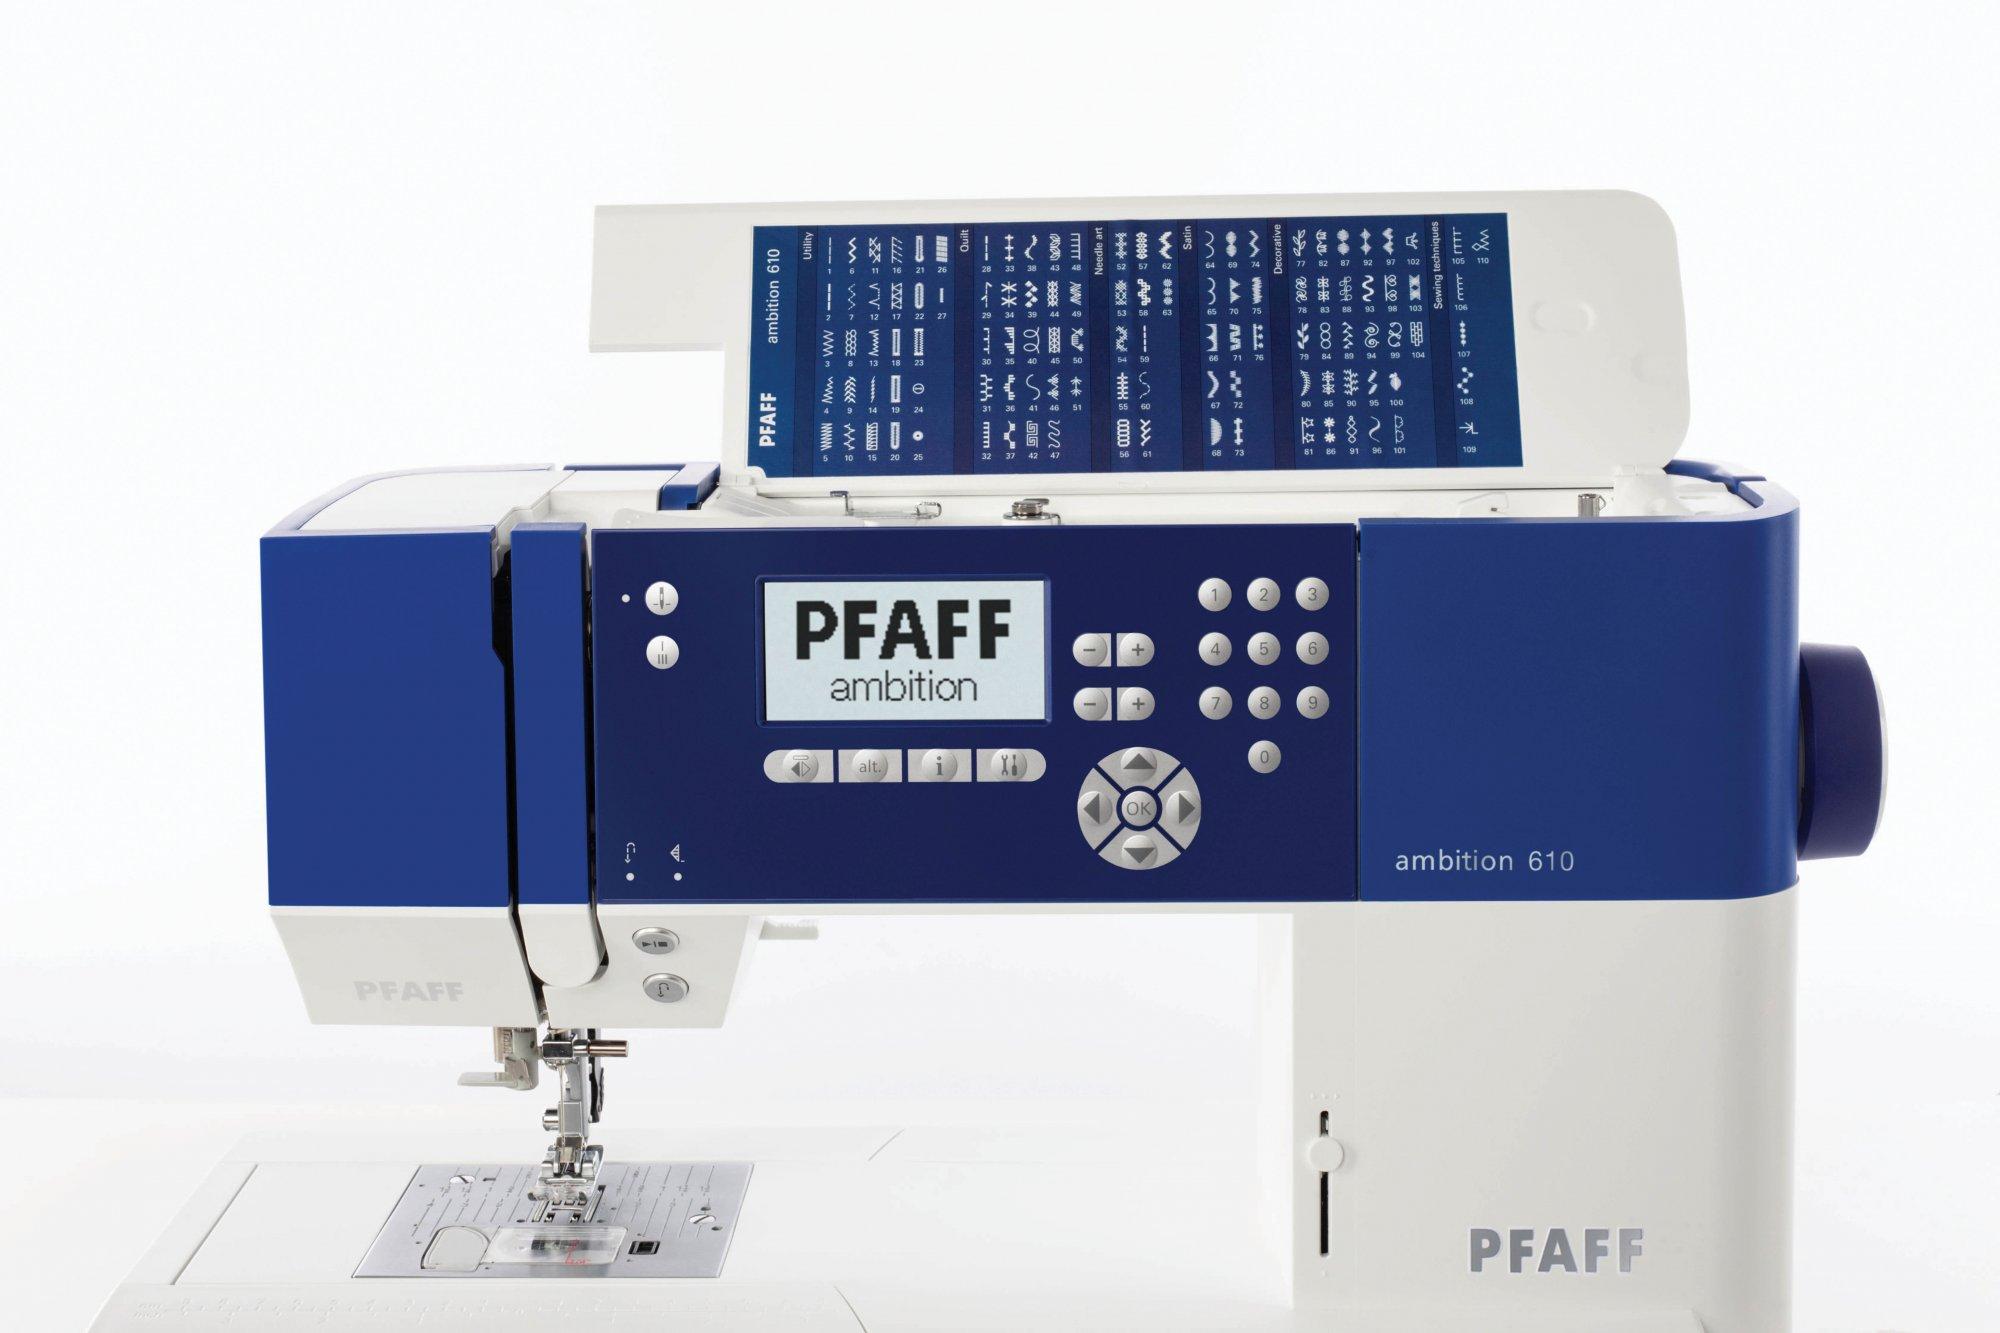 Pfaff Ambition Sewing Machine Needle Threader Hook